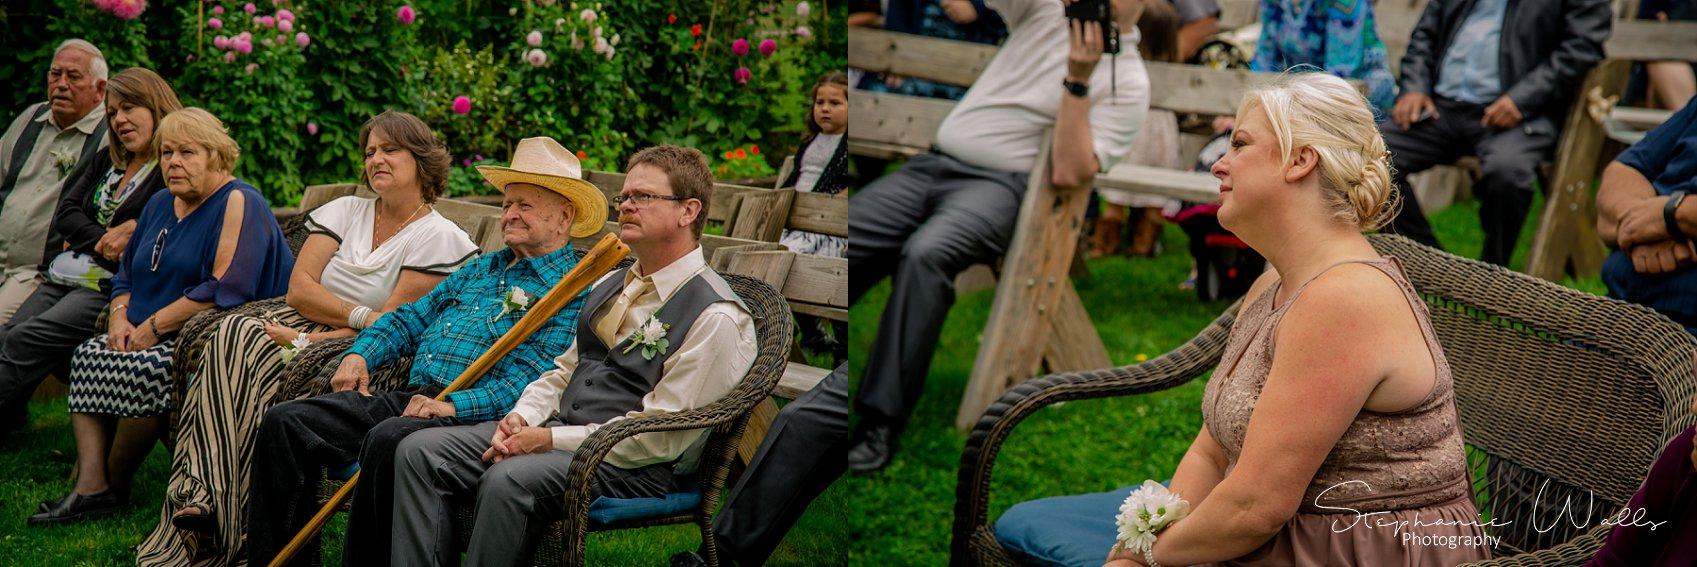 Kimble Wedding 157 1 Marlena & Allans | Snohomish Red Barn Events (Stocker Farms) | Snohomish, Wa Wedding Photographer